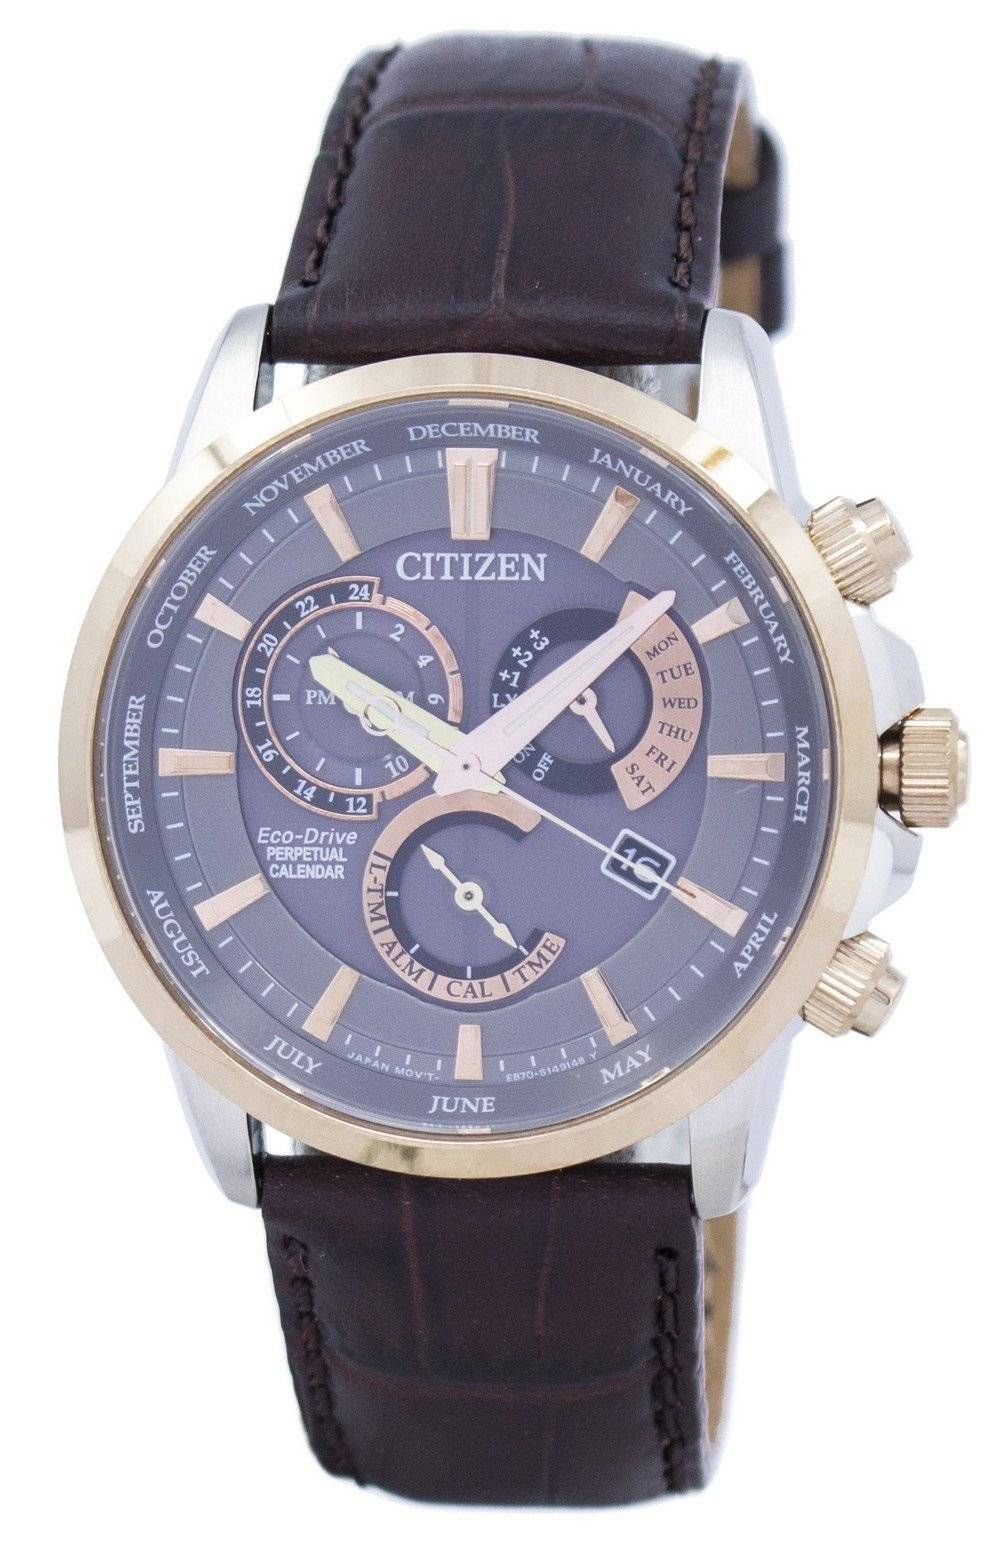 67baa711a1b Citizen Eco-Drive Chronograph Perpetual Calendar Alarm BL8148-11H Men s  Watch